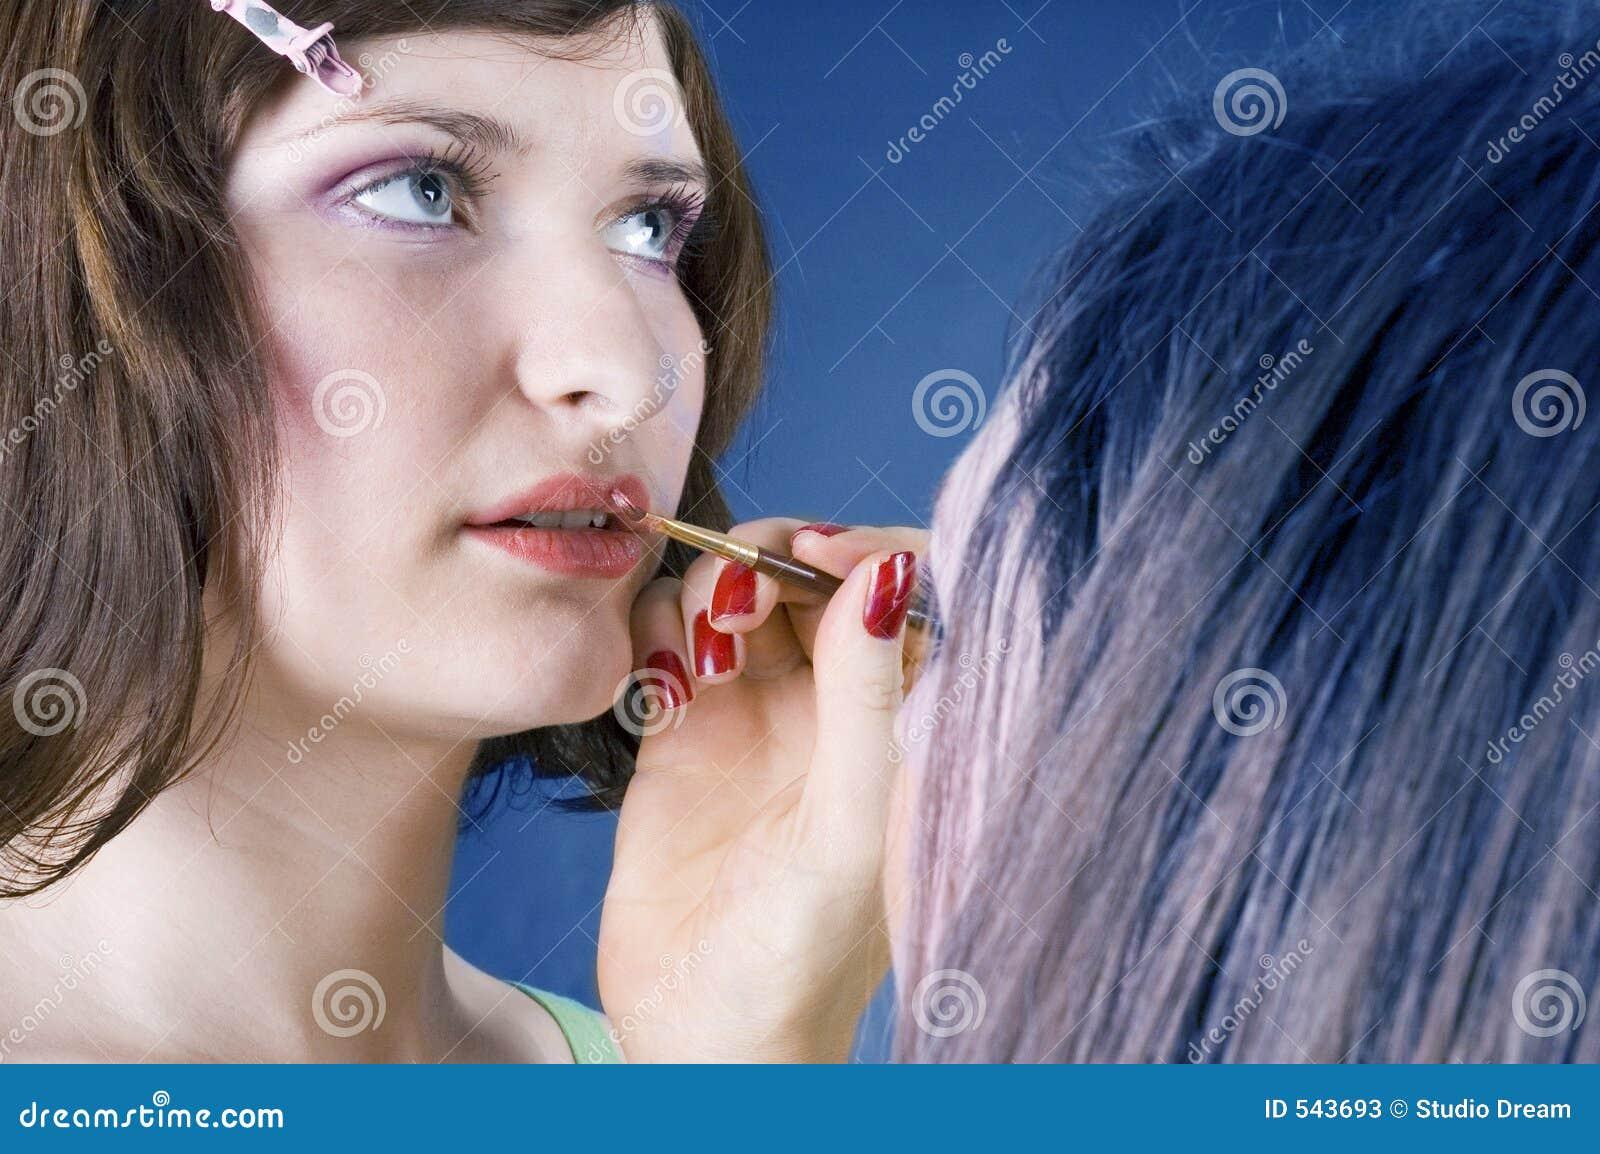 Download 极大组成 库存图片. 图片 包括有 脸红, 唇膏, 头发, 消耗大, beautifuler, 构成, 方式 - 543693